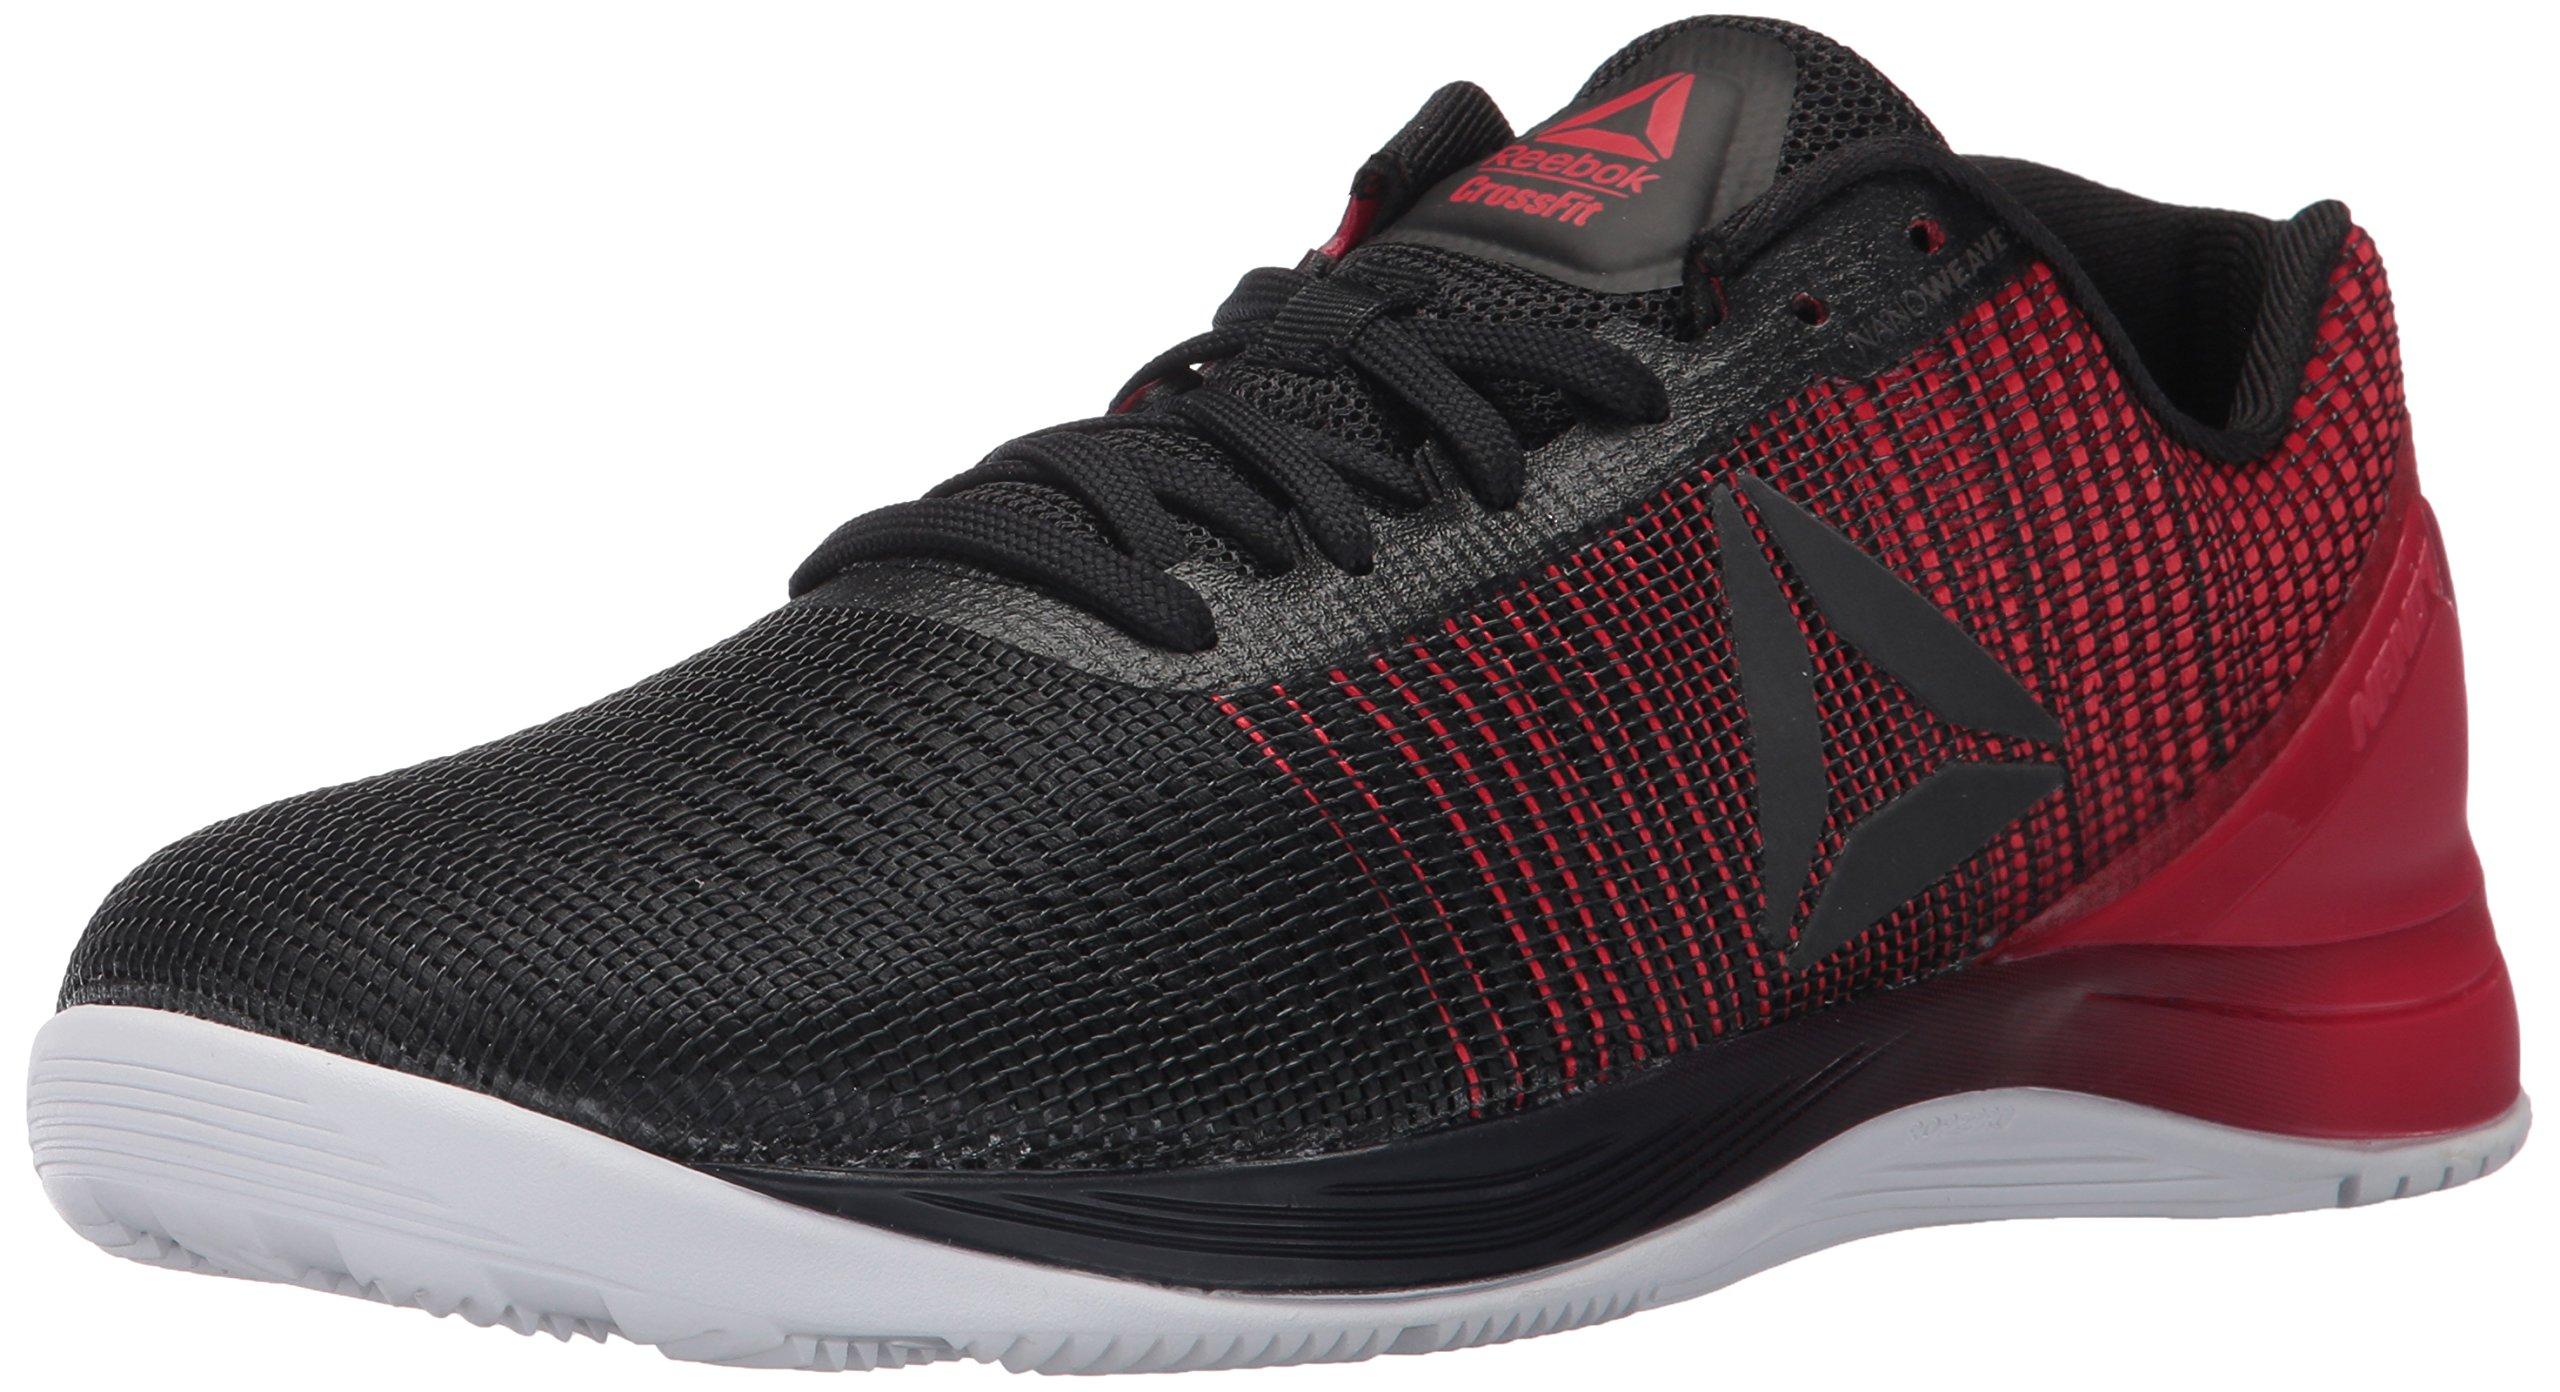 Reebok Men's Crossfit Nano 7.0 Cross-Trainer Shoe, Black/White/Primal Red, 13 M US